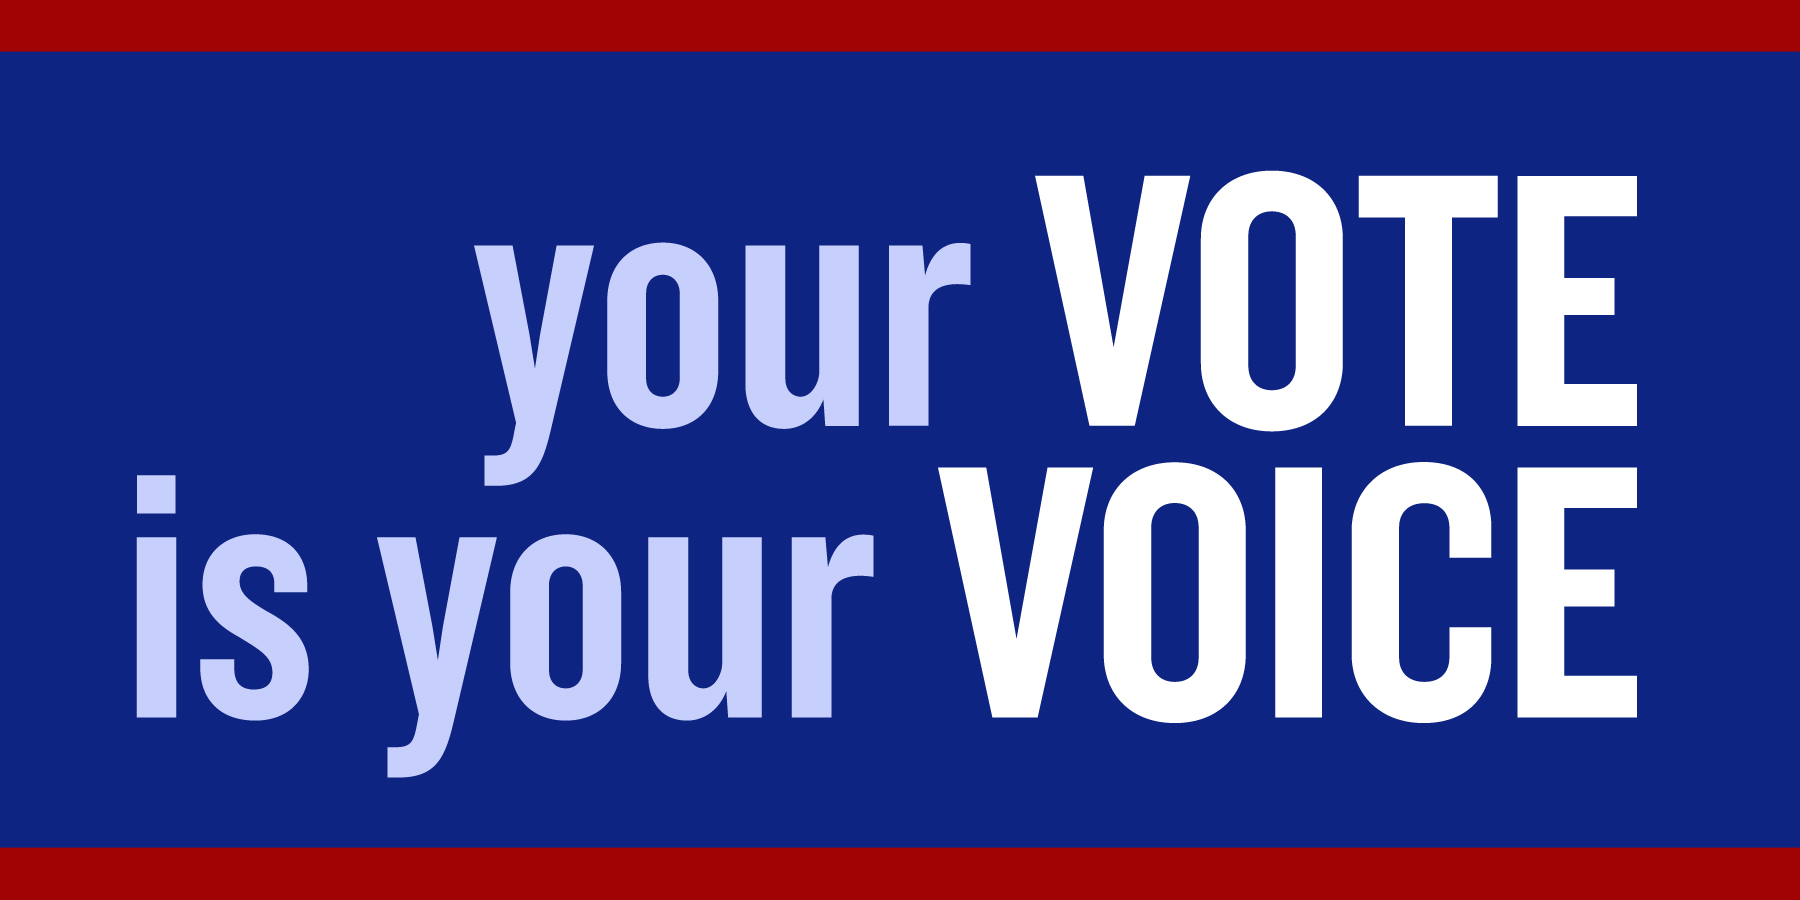 Geaux Vote! – Louisiana Violence Reduction Coalition